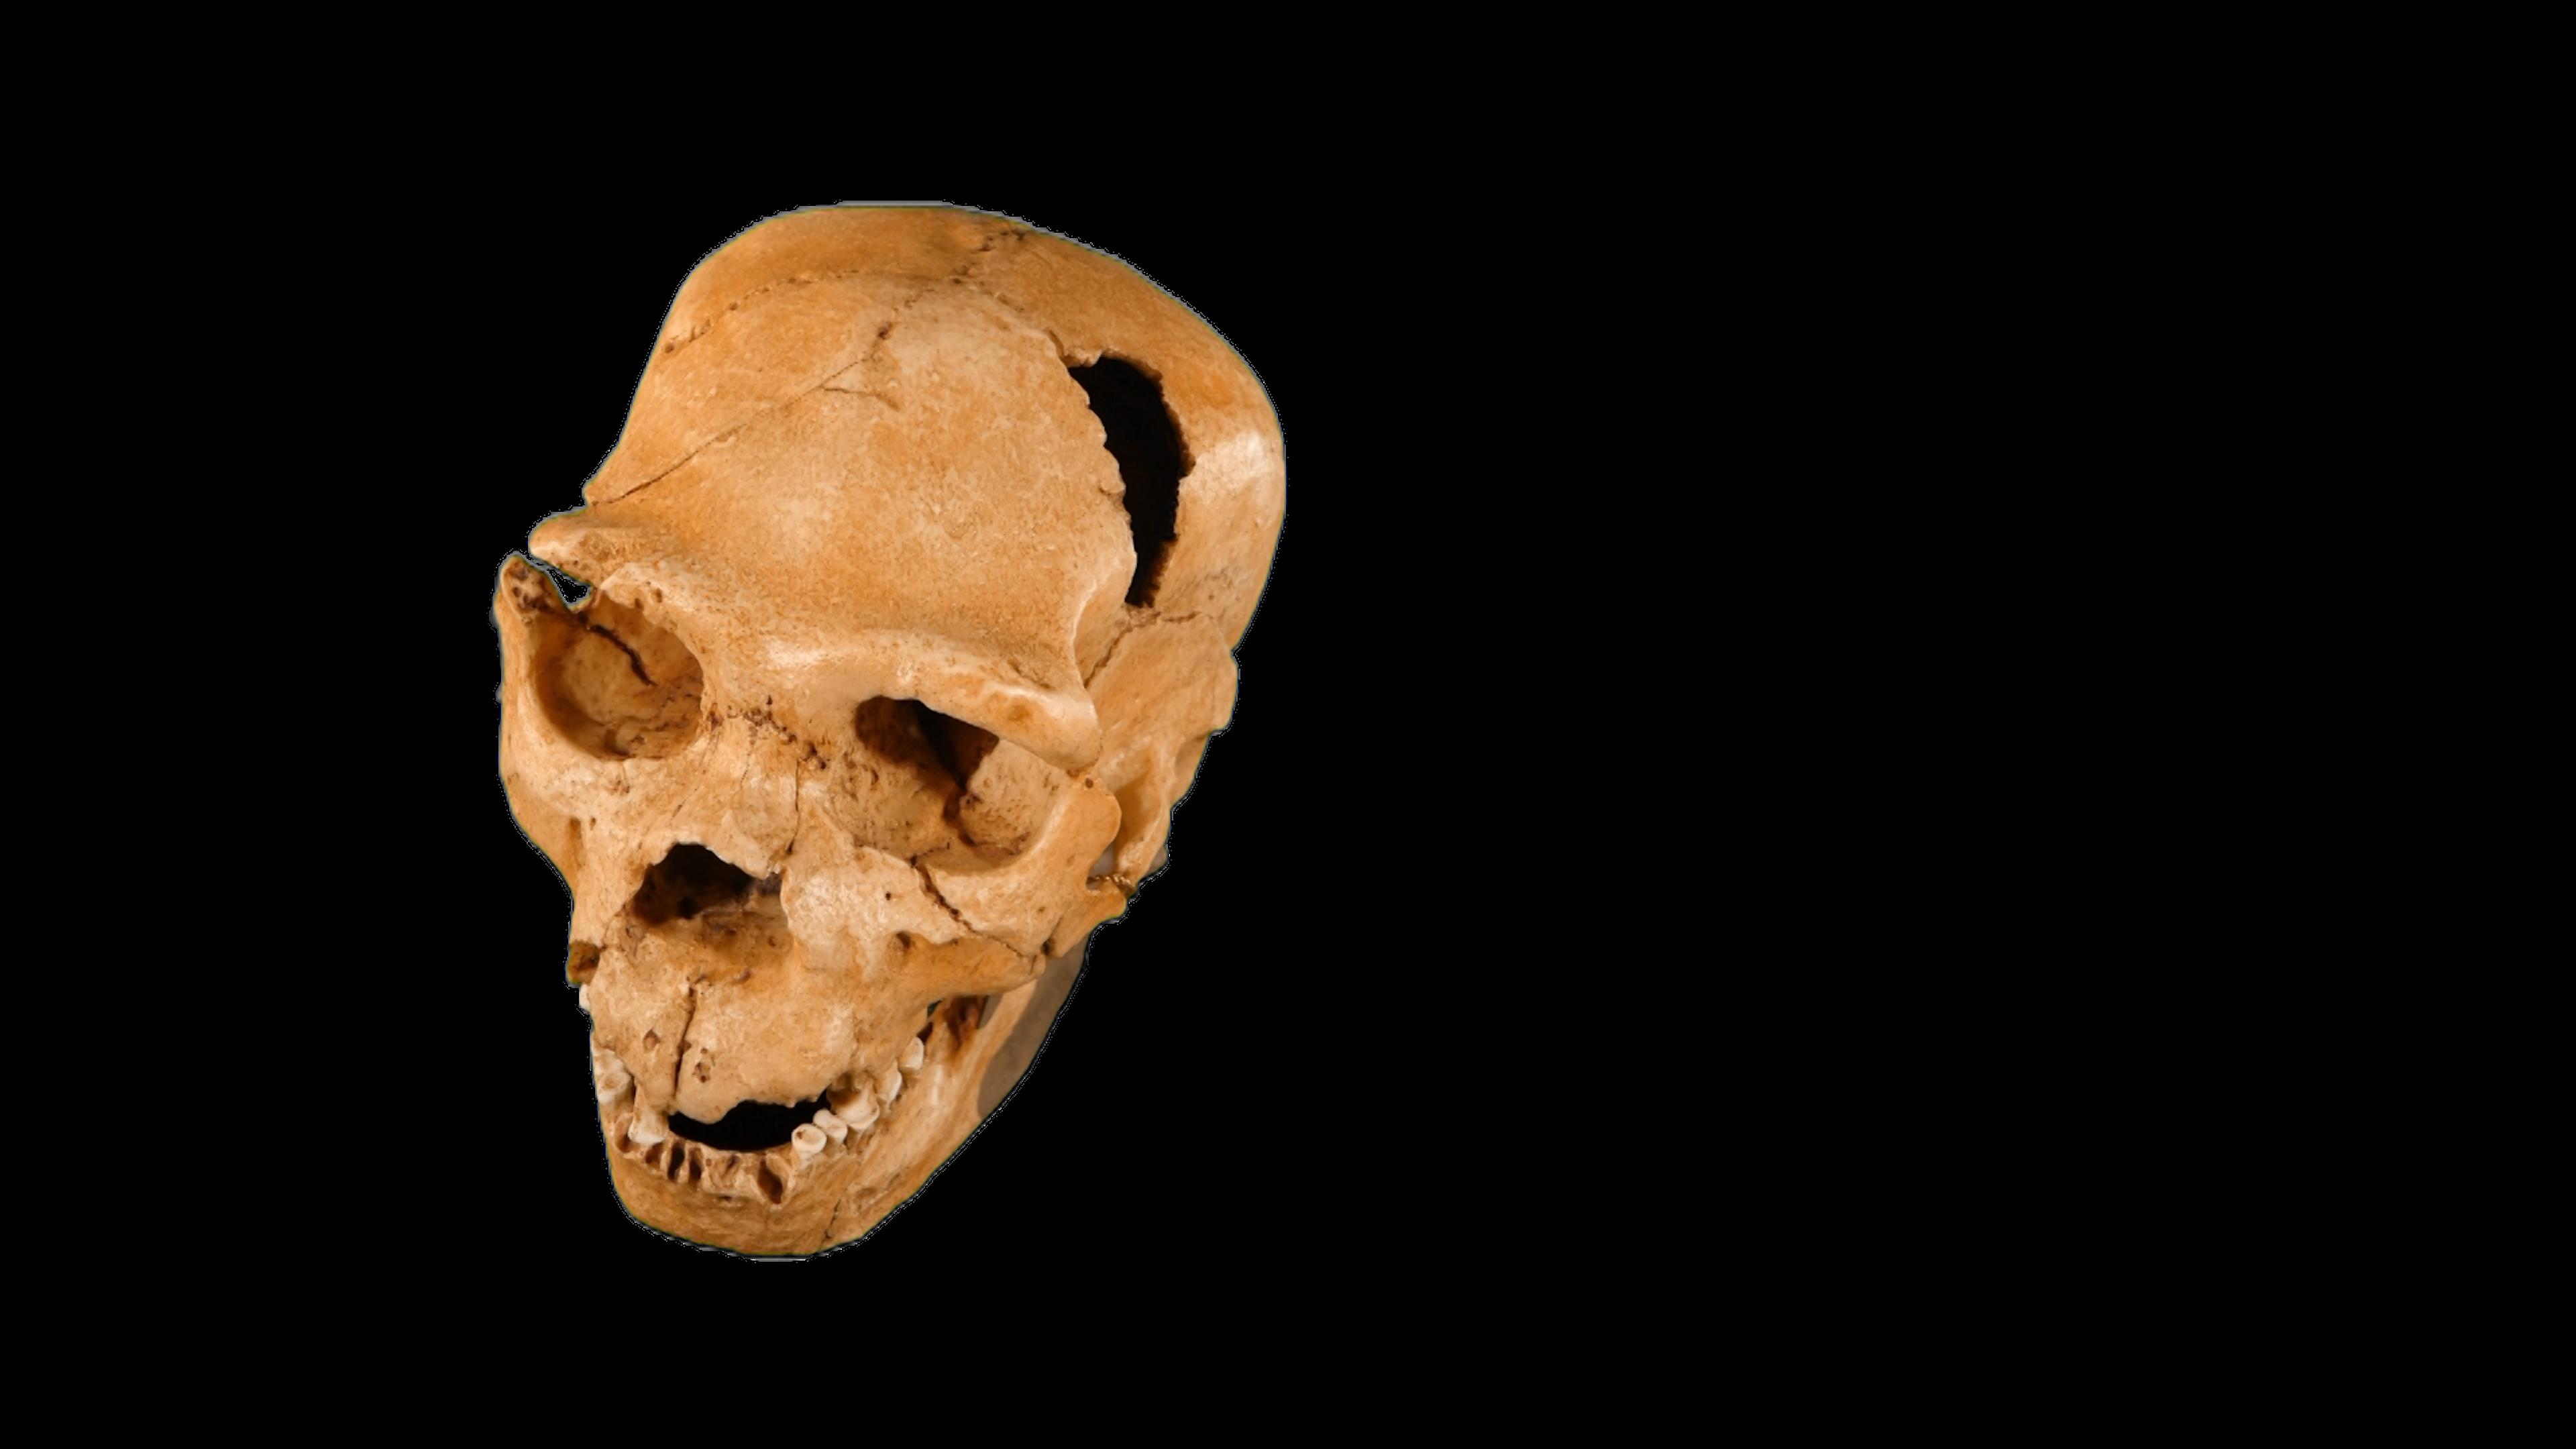 Skull of Early Homo neanderthalensis